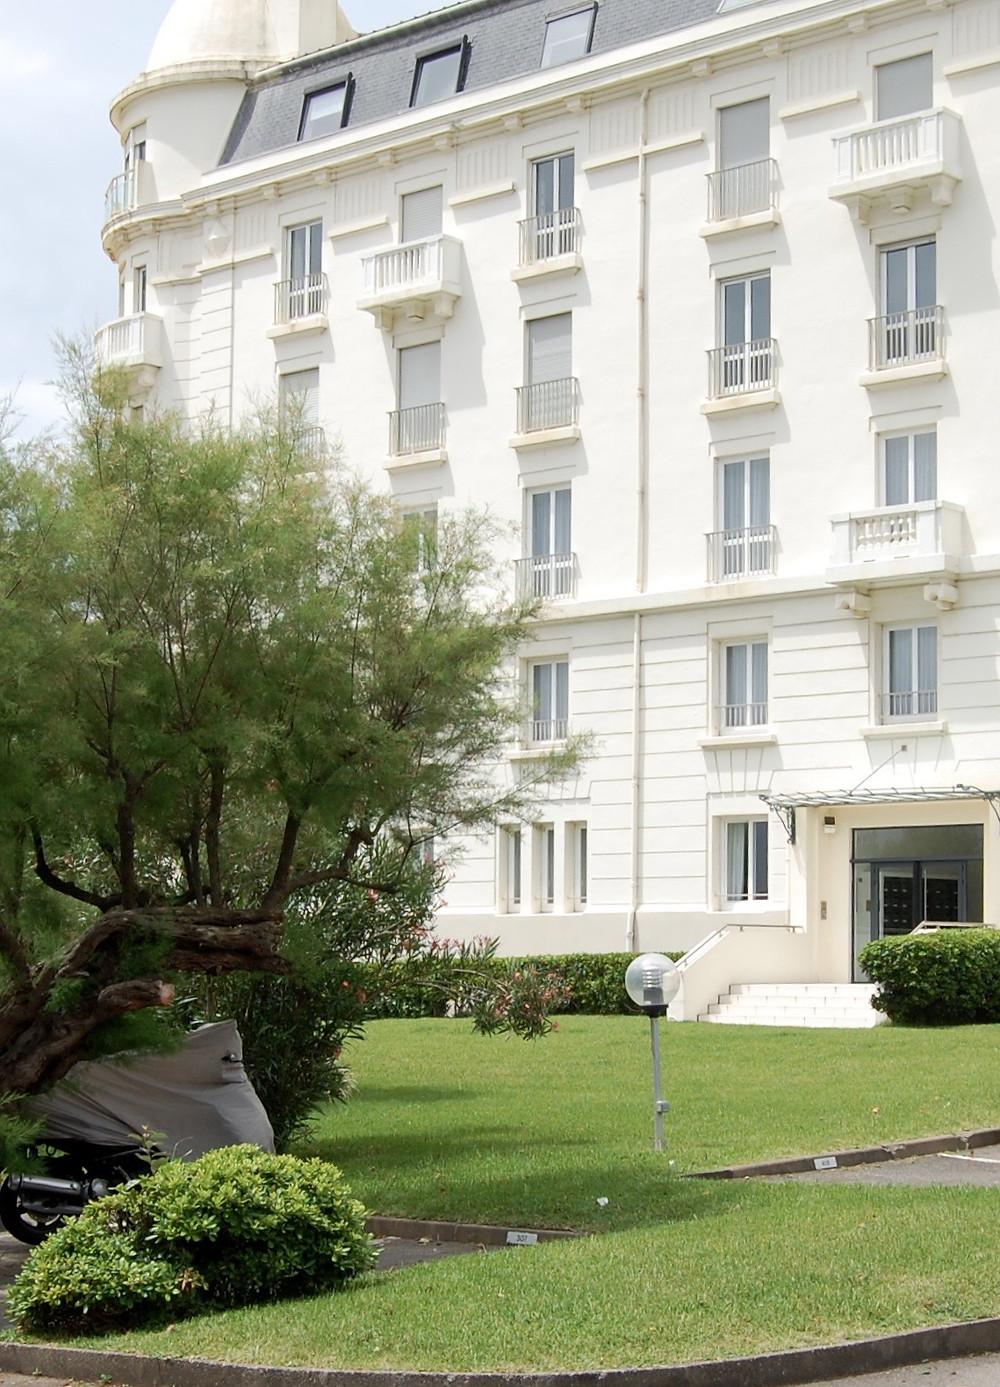 Superbe appartement à vendre à Biarritz Front de Mer